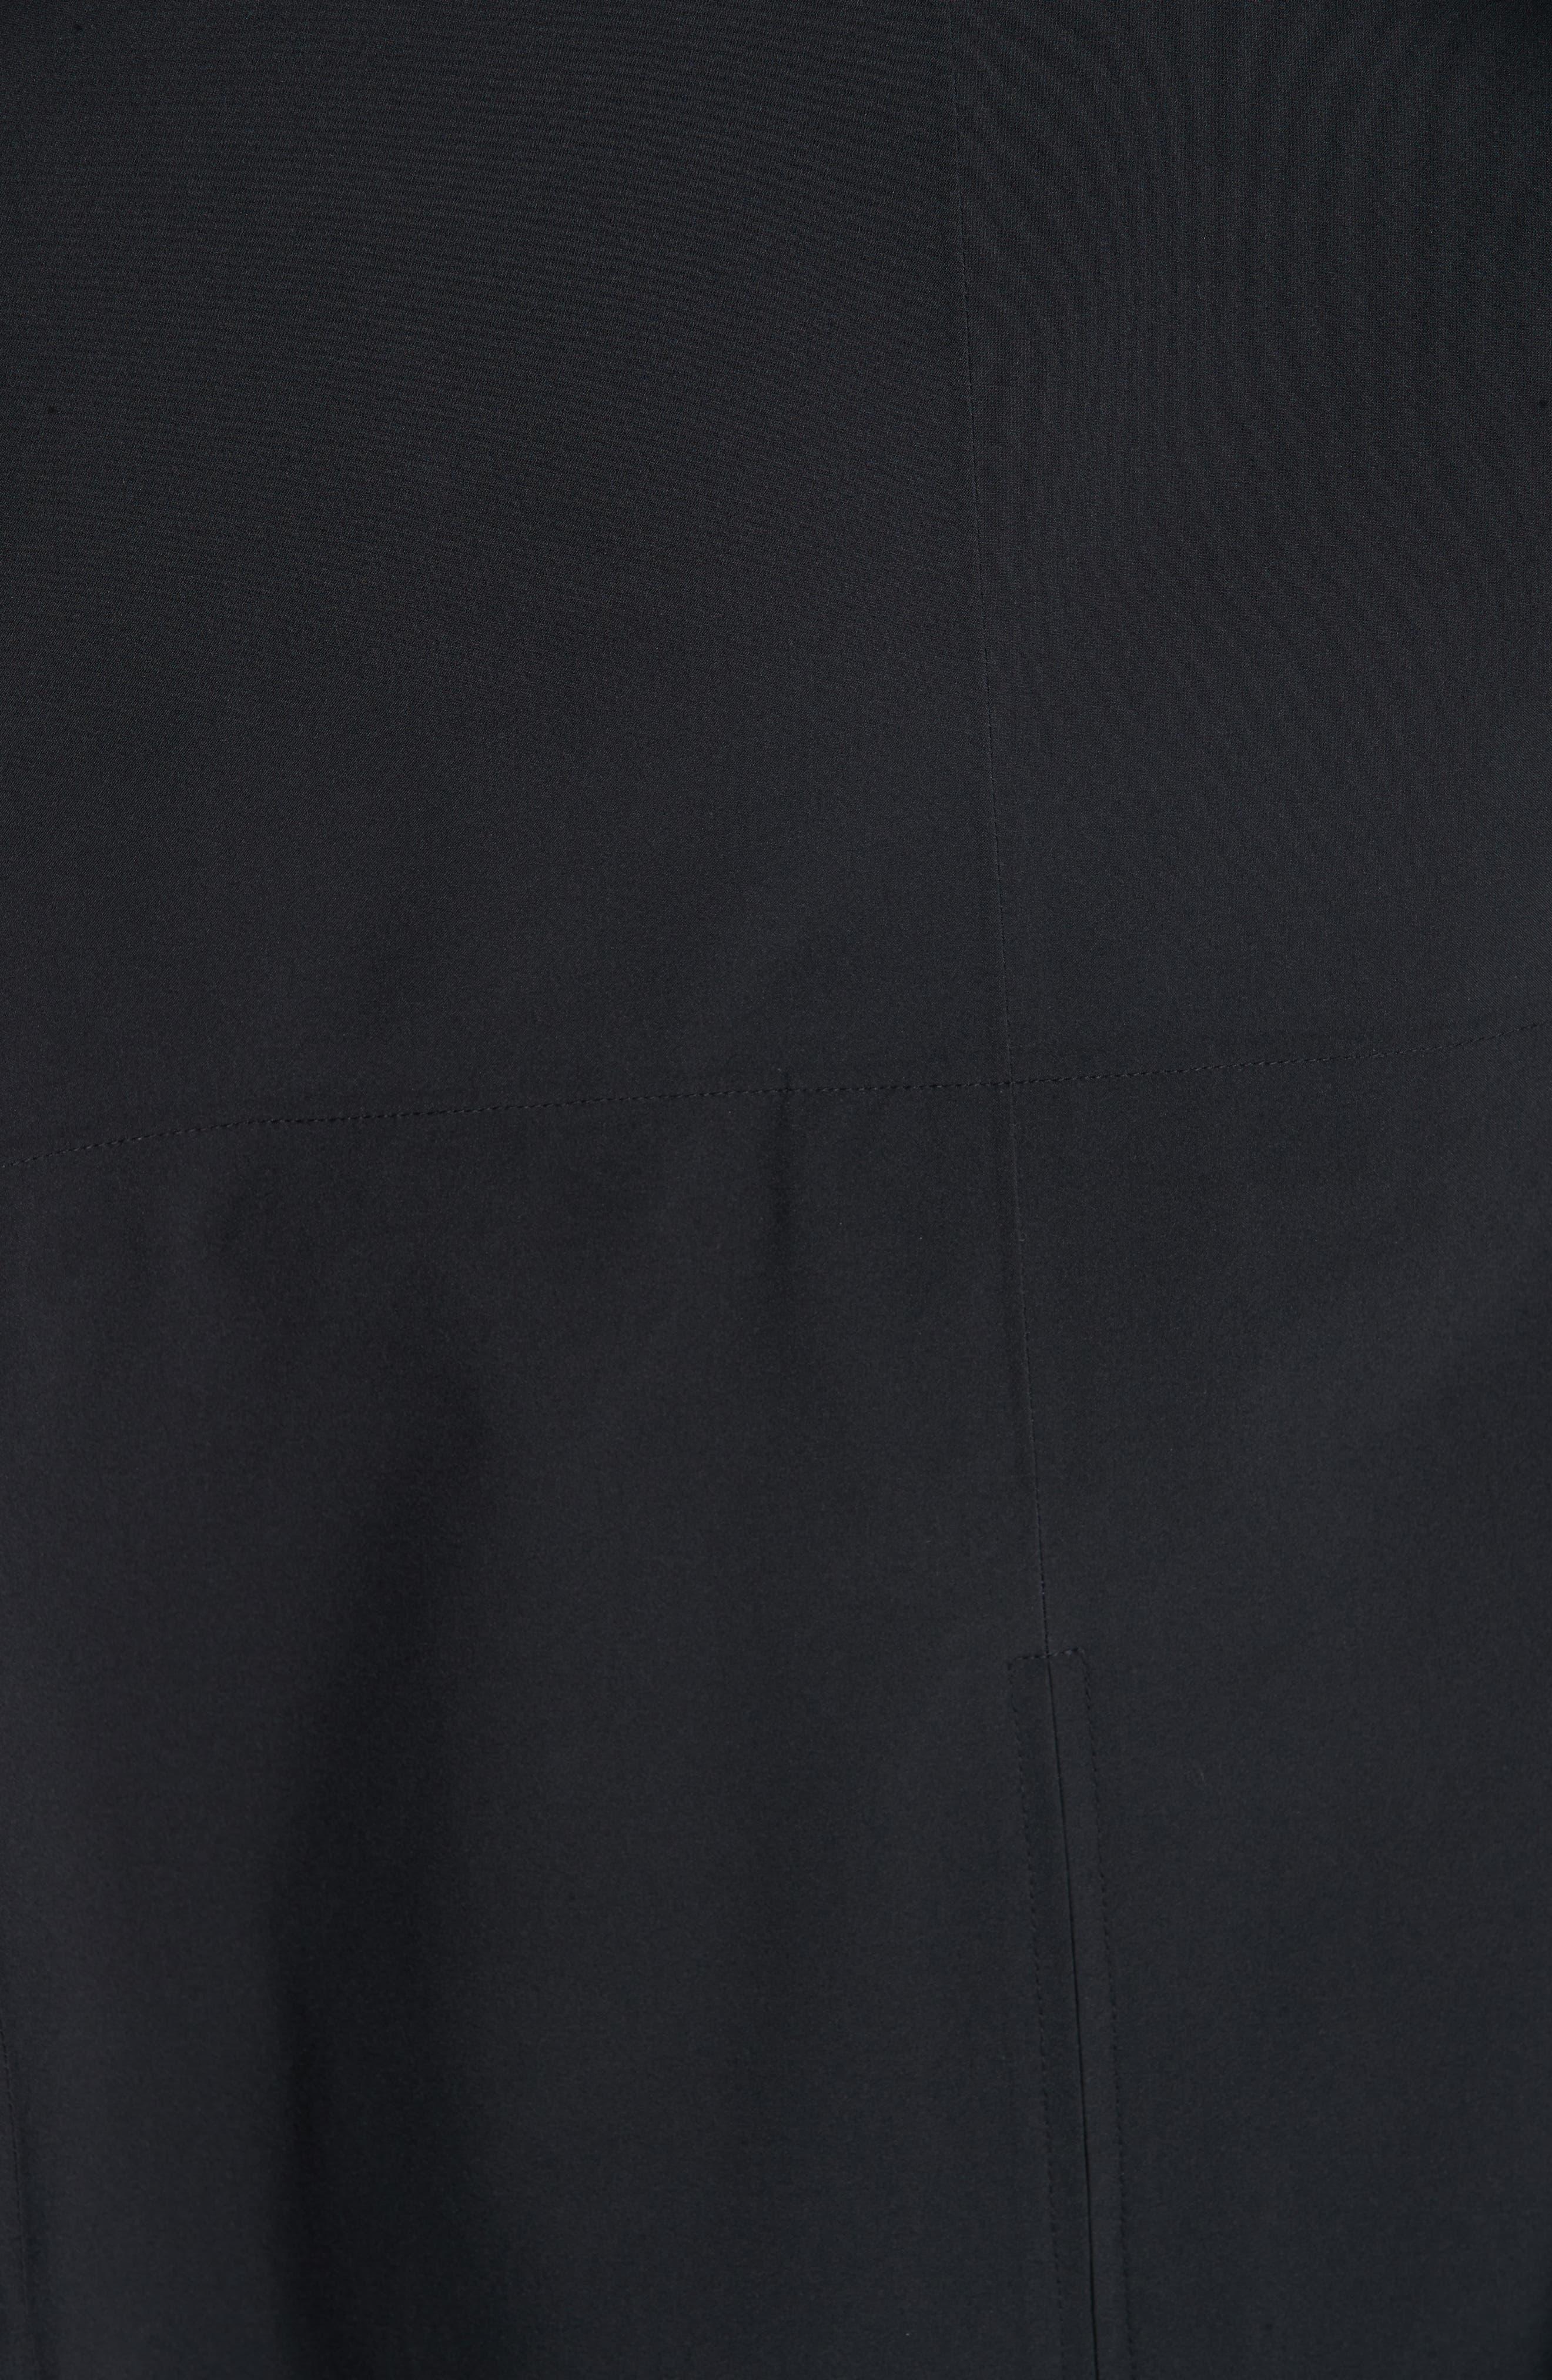 Z Zenga Trim Fit 3-in-1 Jacket,                             Alternate thumbnail 7, color,                             BLACK